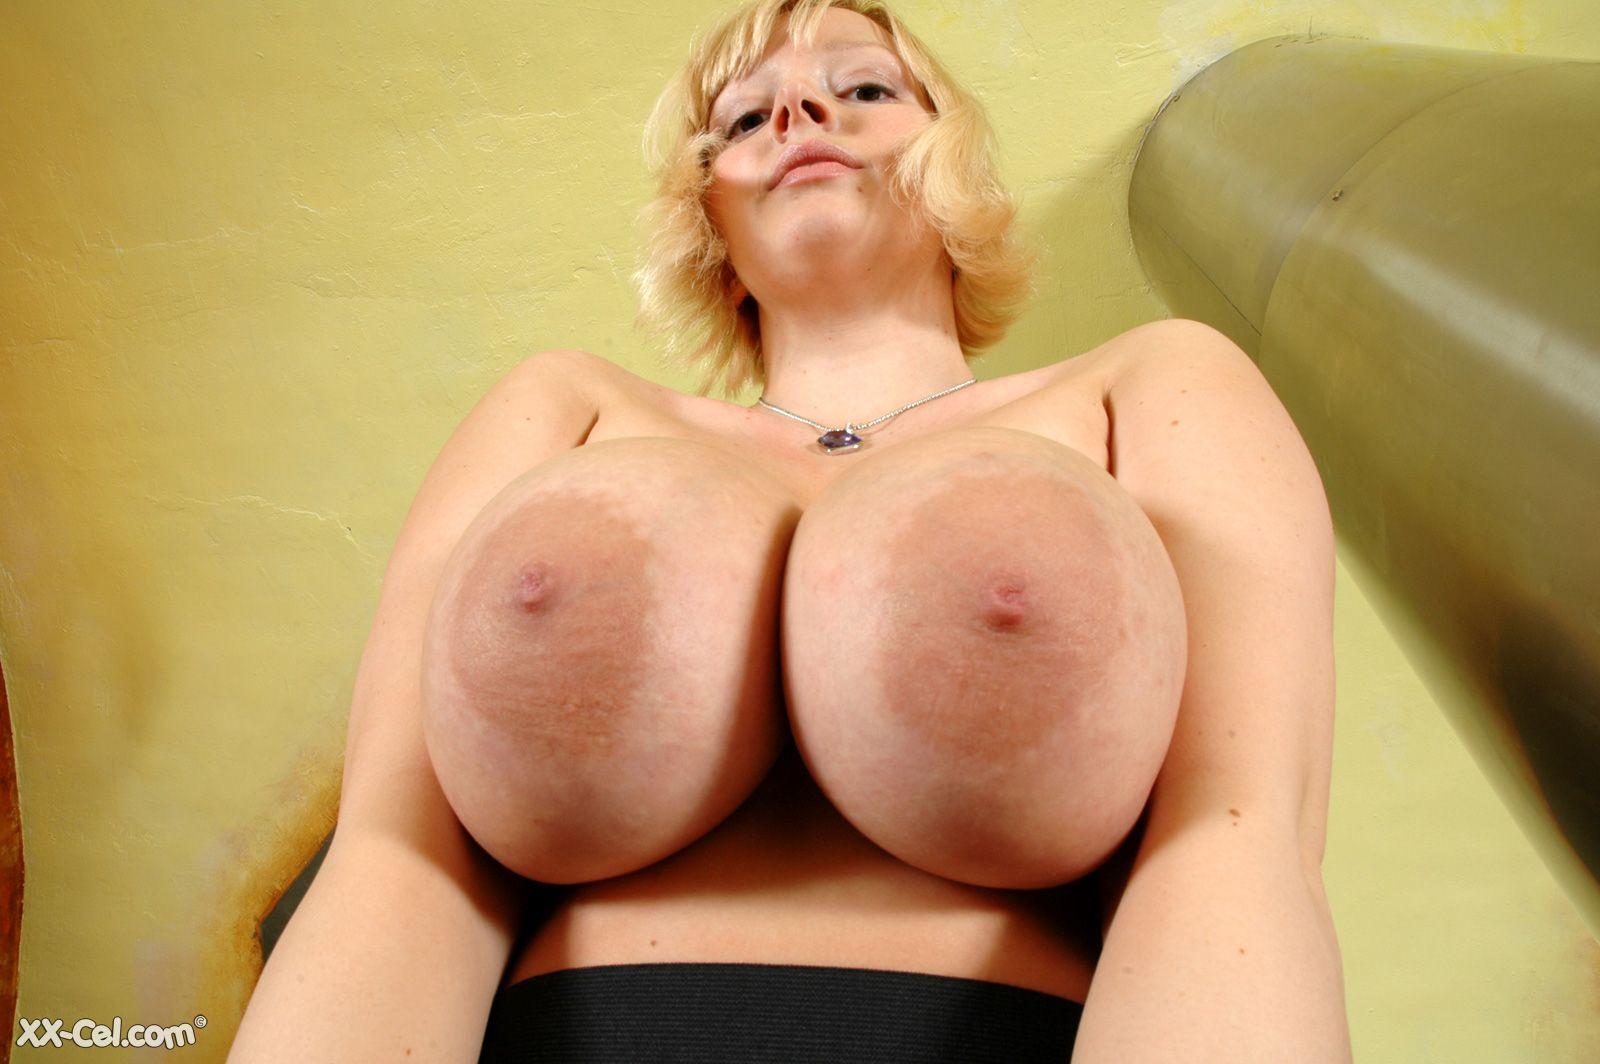 Sex Hq Mobile Pics Xx Cel Eleanor To Big Tits Hqhole